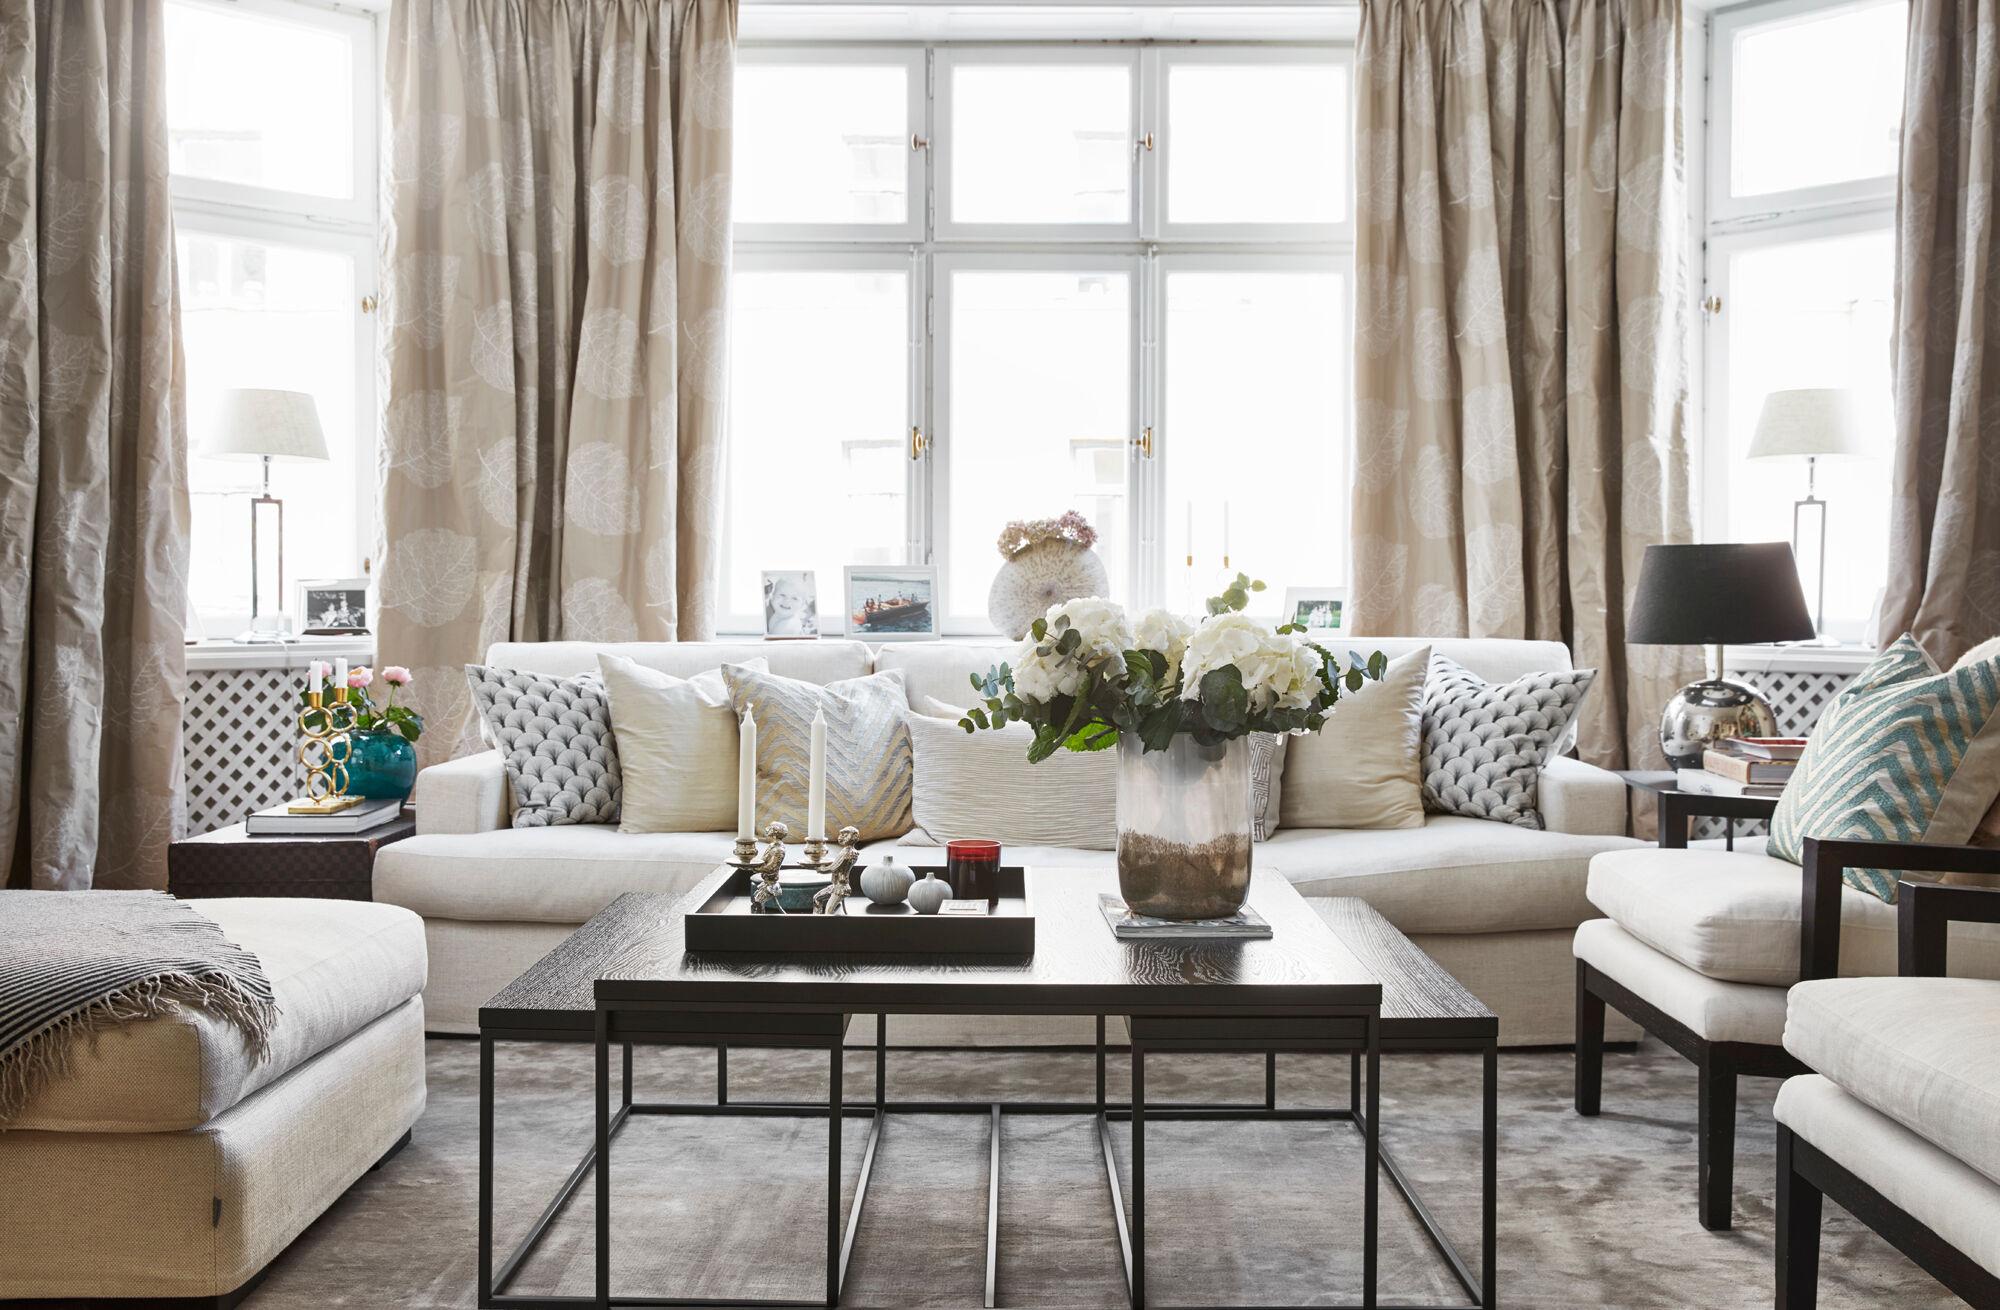 stephanie-vardagsrum-gardiner-soffbord-soffa-matta